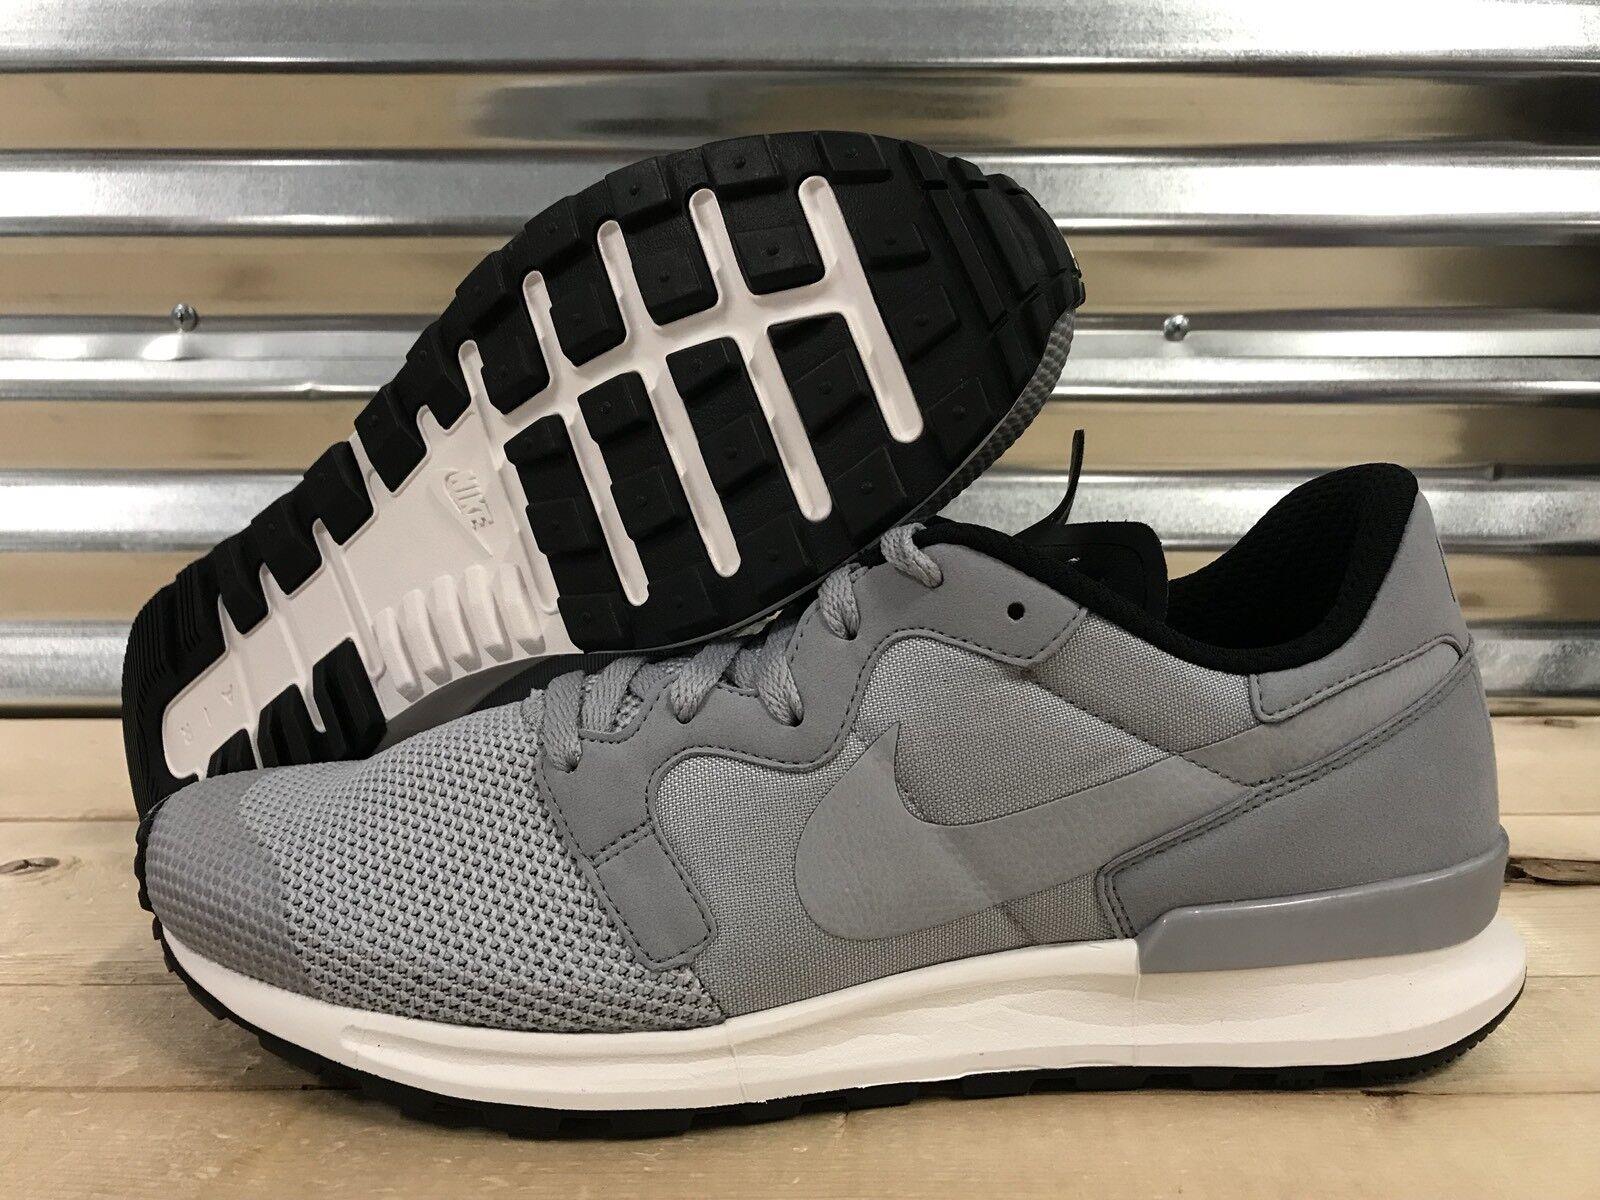 Nike Air Berwuda Premium PRM Running shoes Wolf Grey White SZ 13 ( 844978-002 )